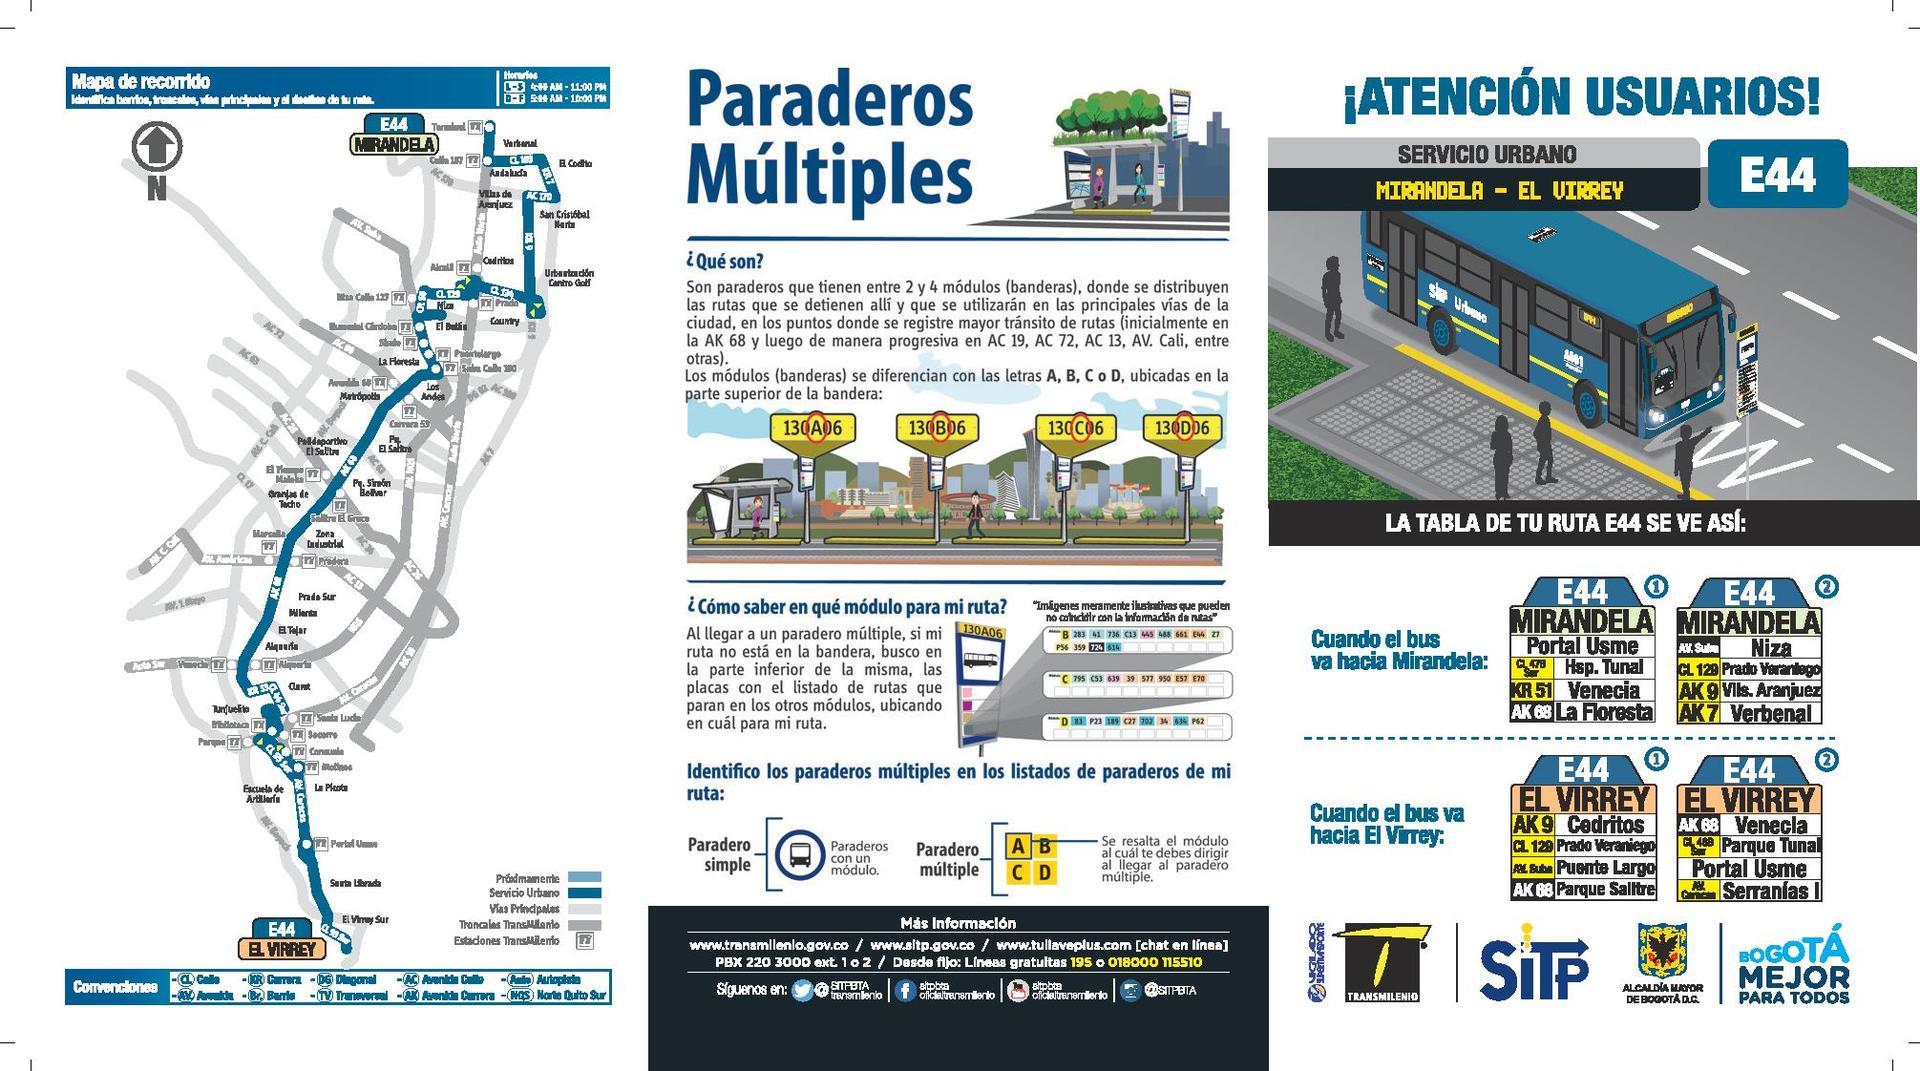 E44 urbana se extiende a Mirandela